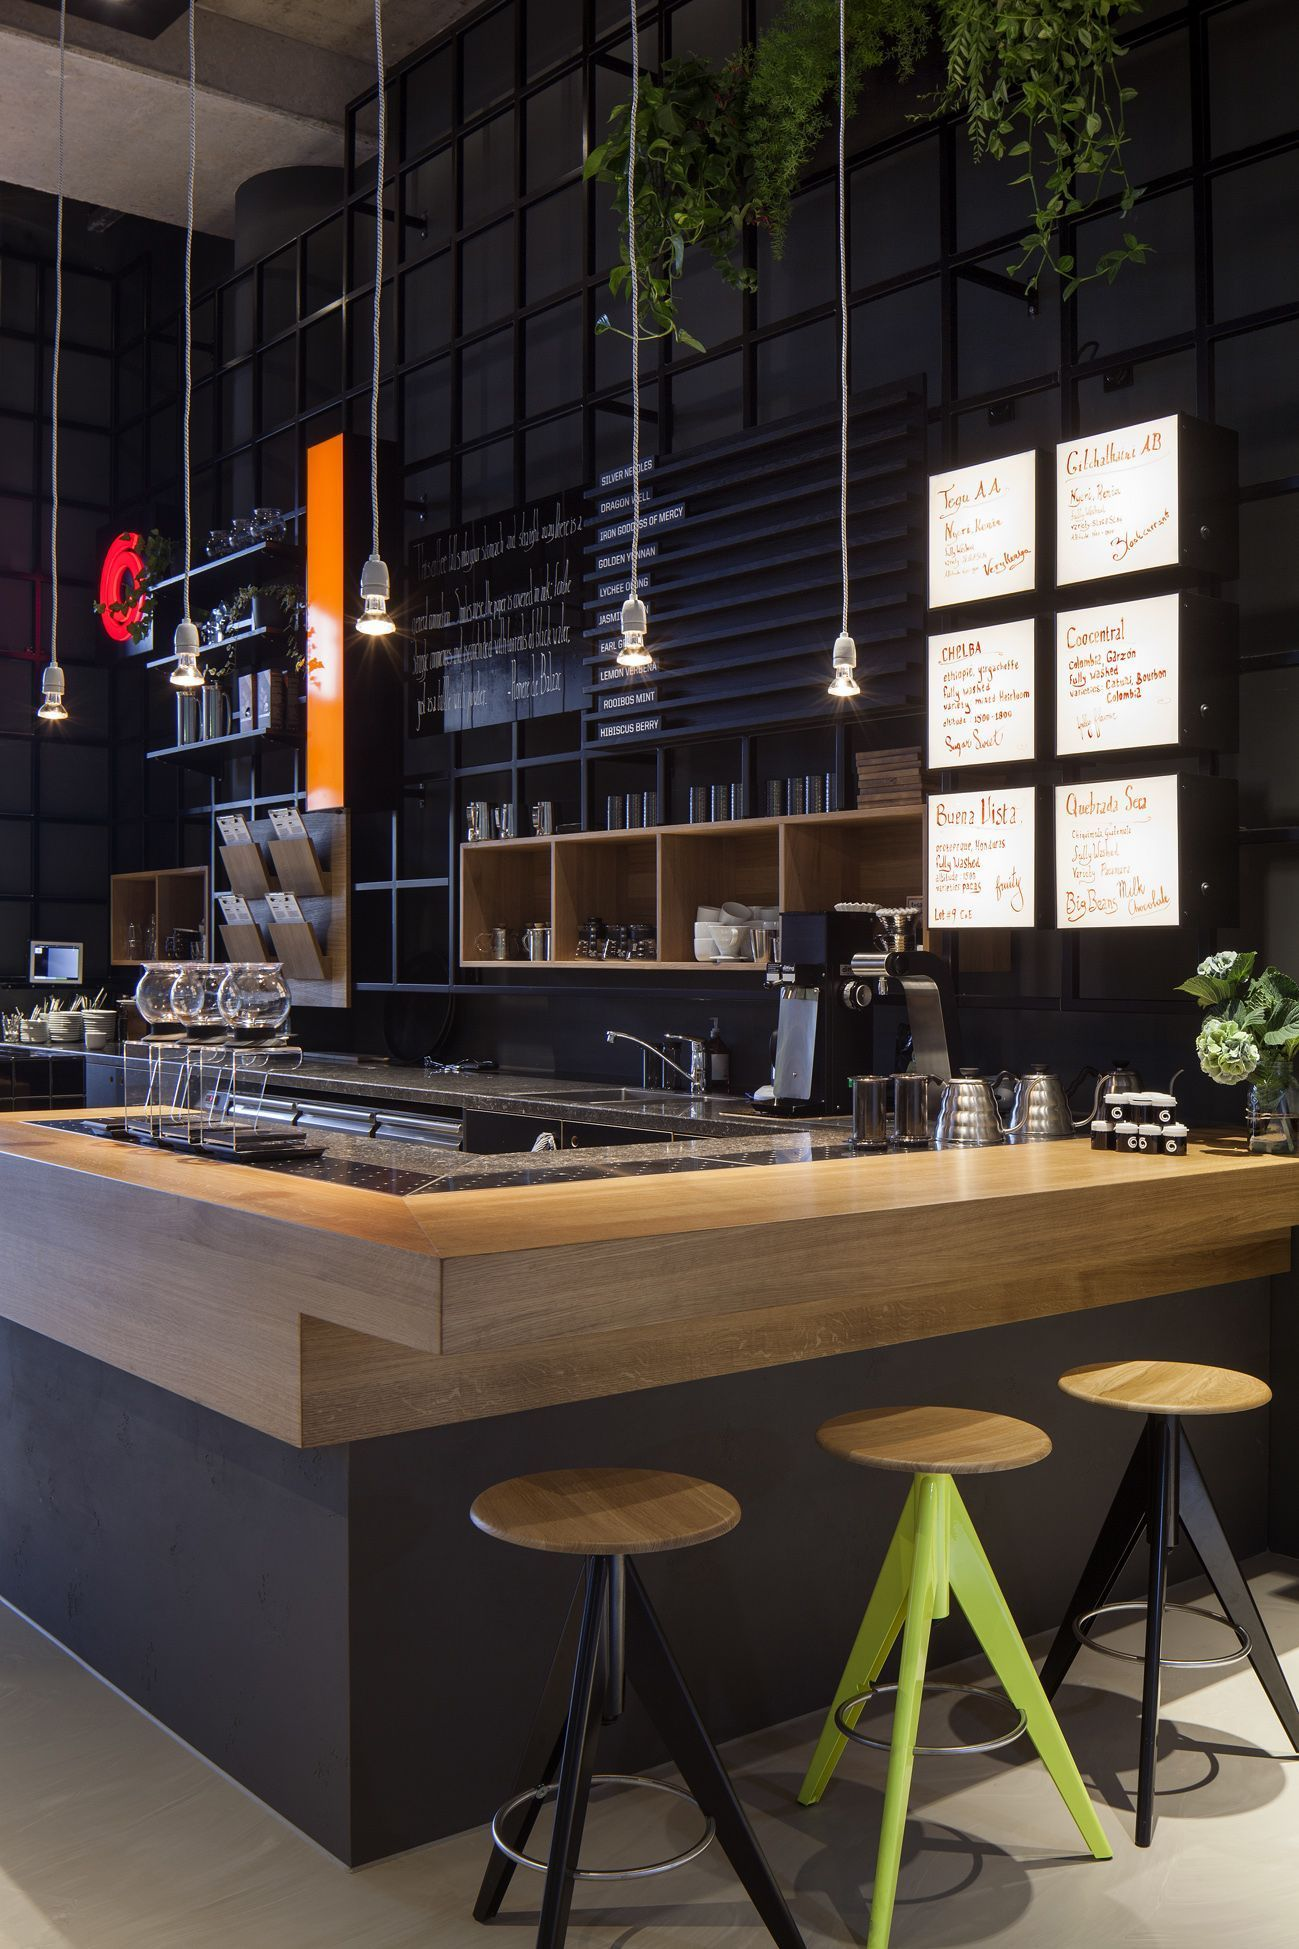 Pin By Ivor Poljak On Novo Coffee Shop Decor Coffee Shops